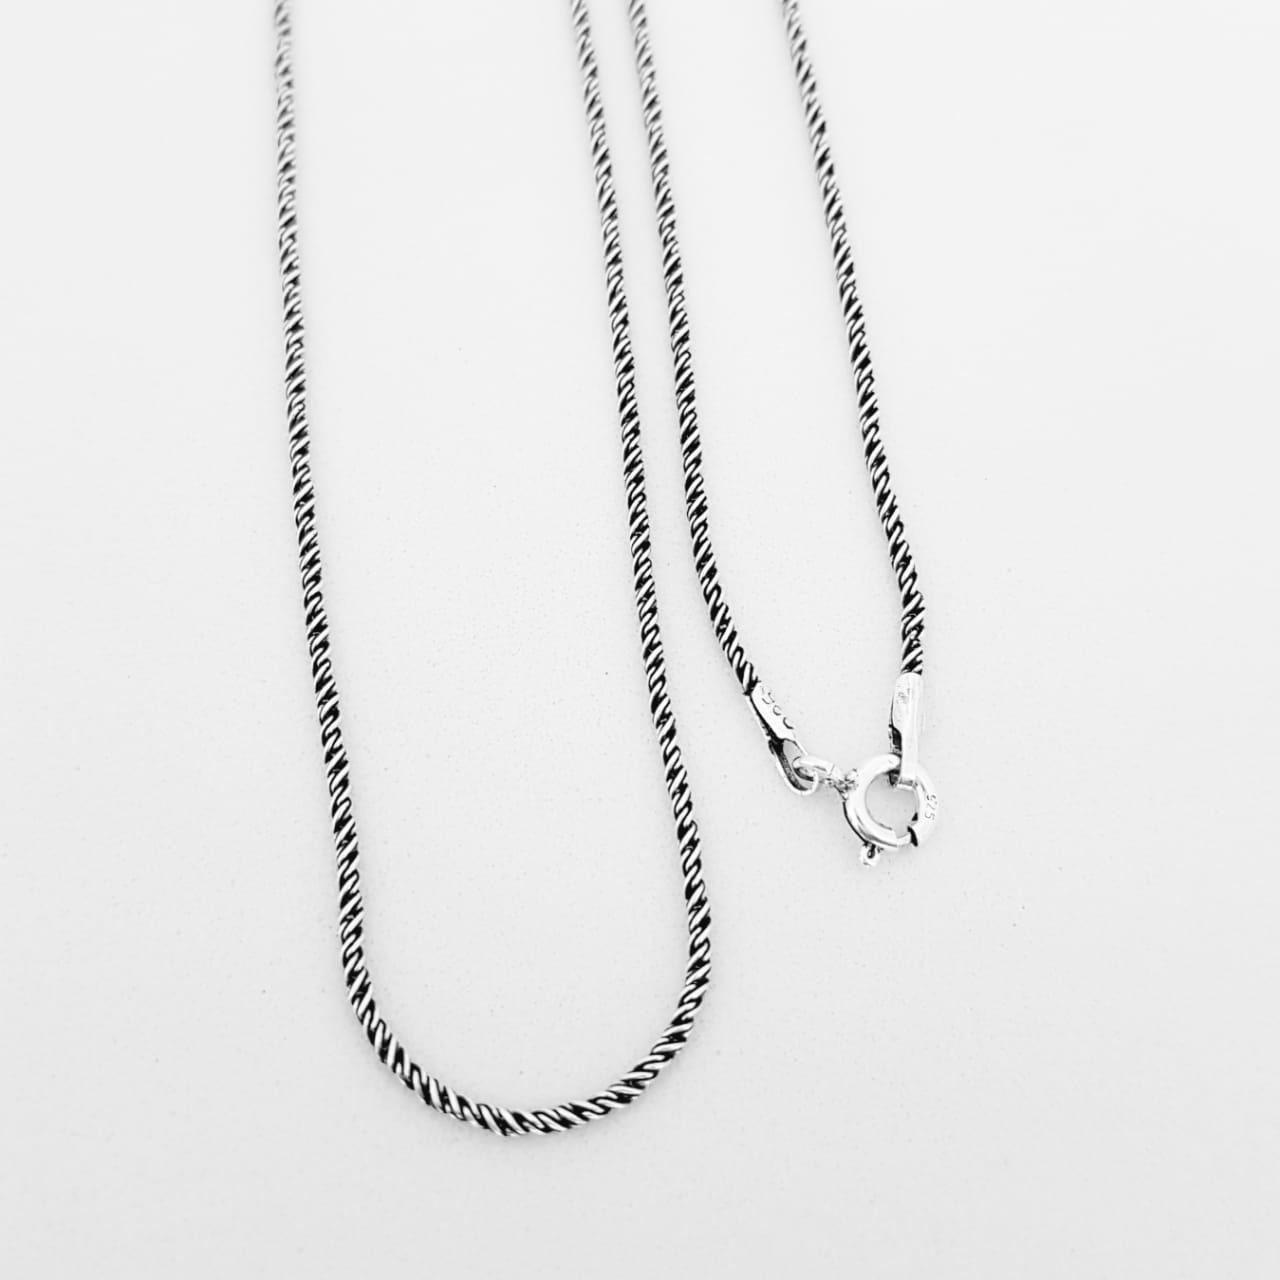 Corrente de Prata Trama Bali - 80 cm